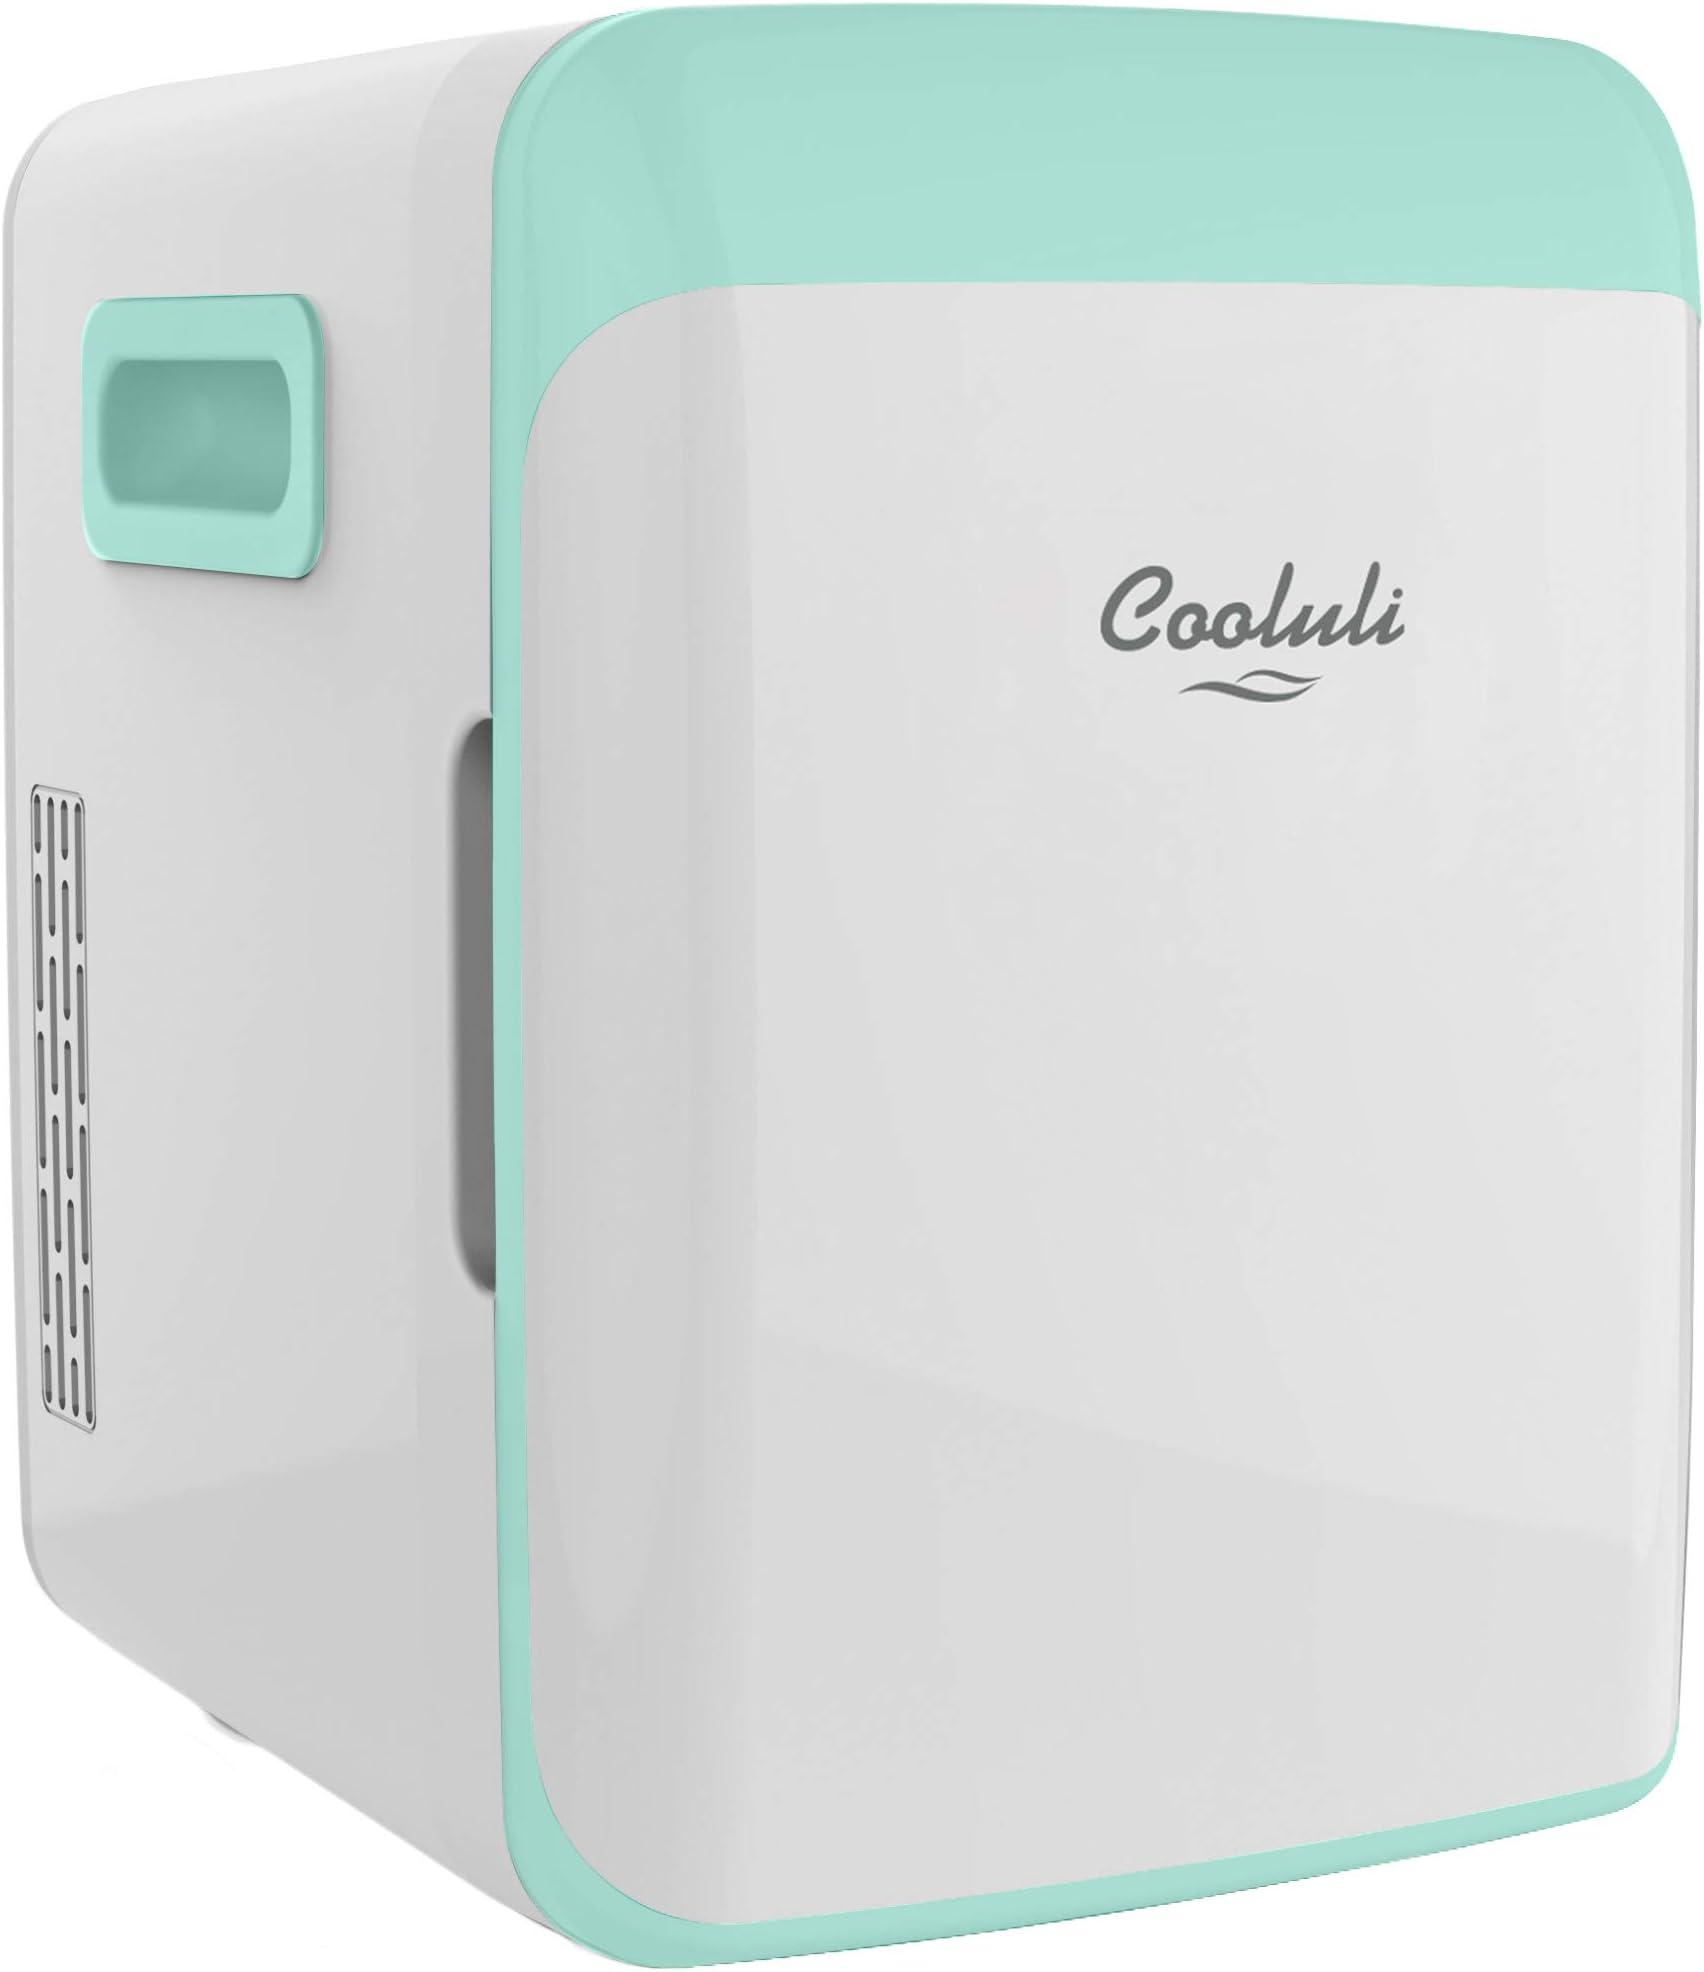 Amazon.com Cooluli Classic Turquoise 40 Liter Compact Portable ...